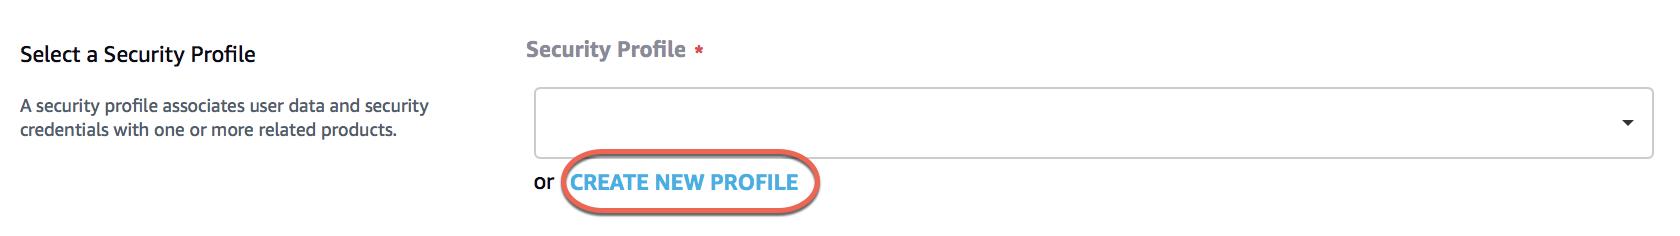 Create Security Profile · alexa/avs-device-sdk Wiki · GitHub